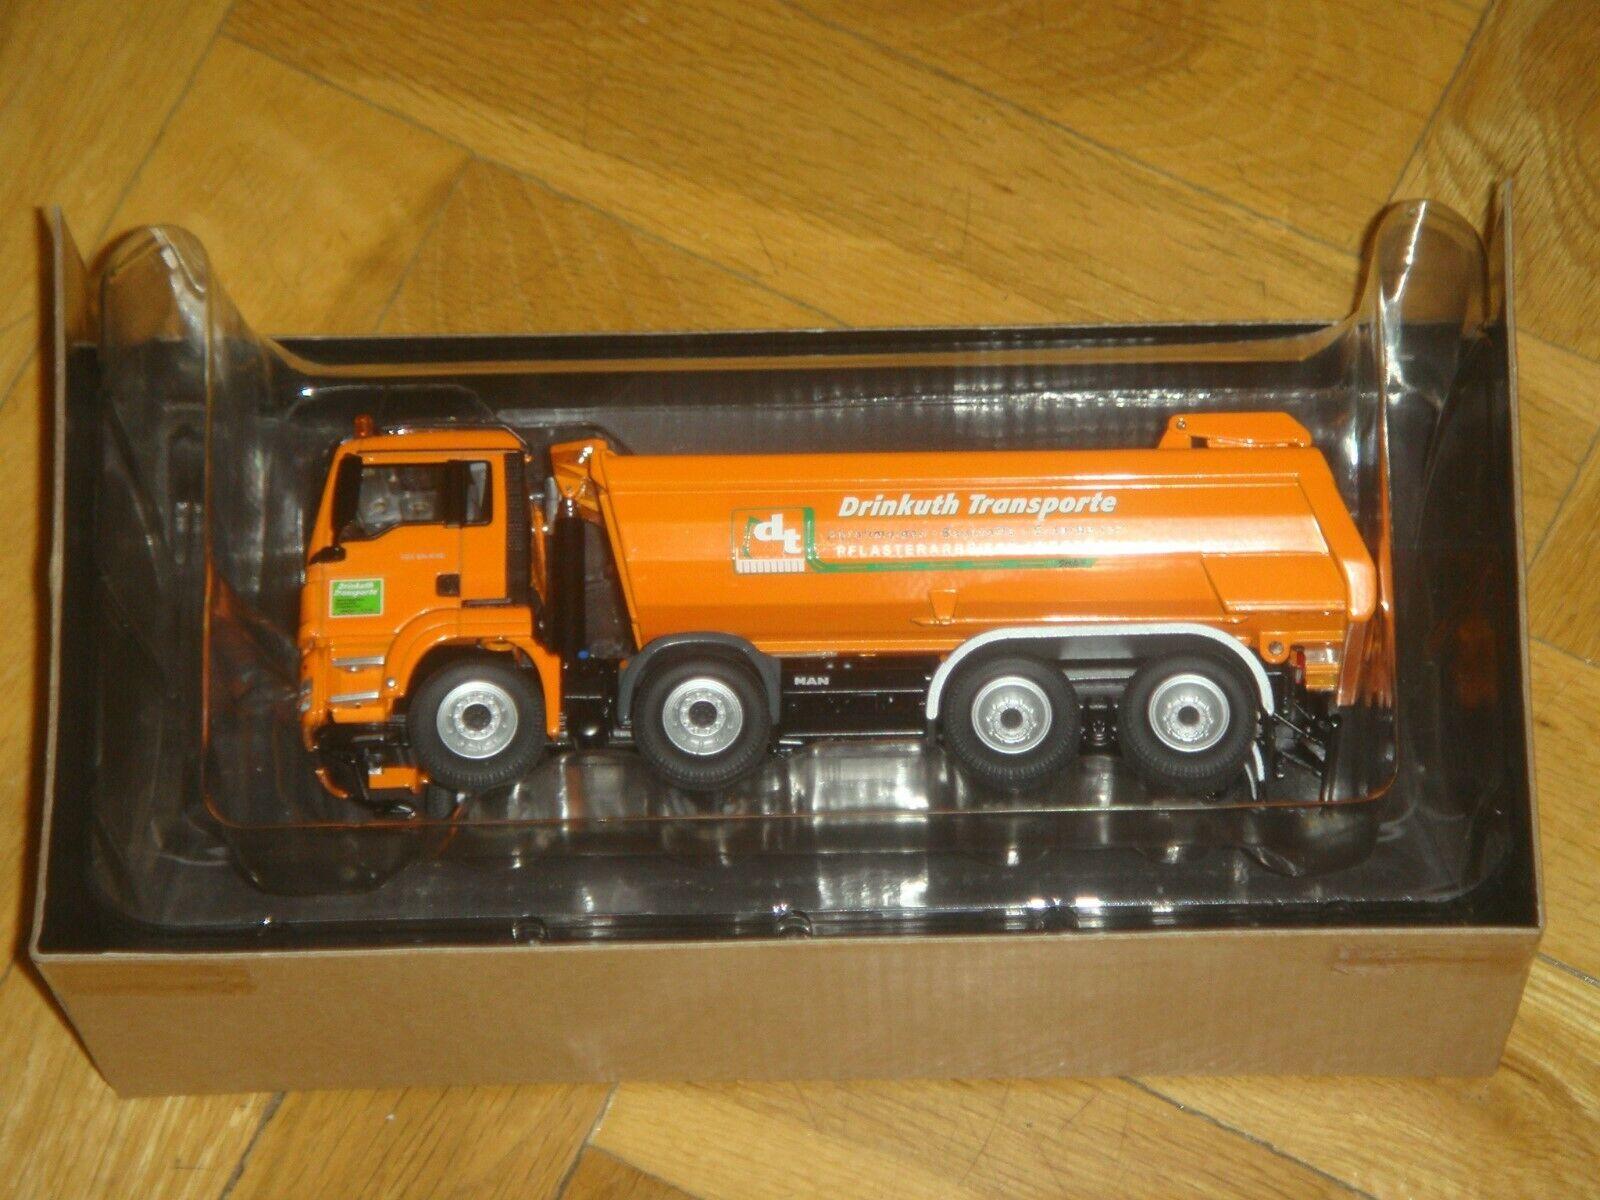 Man tgs 8x4  Drinkuth transport nzg 833 03 1 50 in box. new, brand new - (2